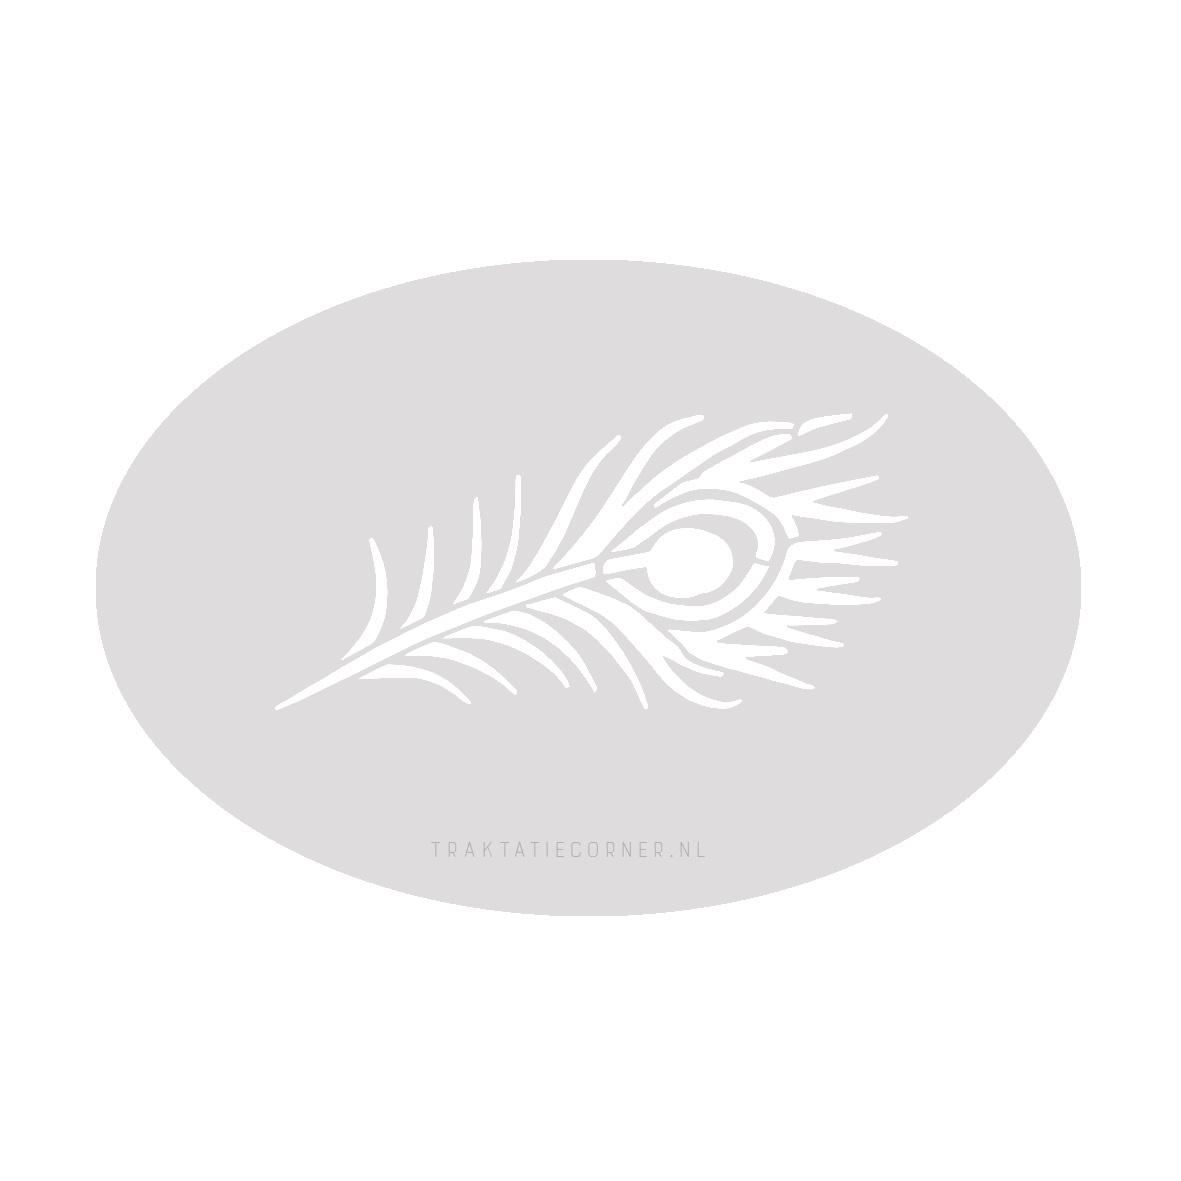 Schminksjabloon pauwenveer